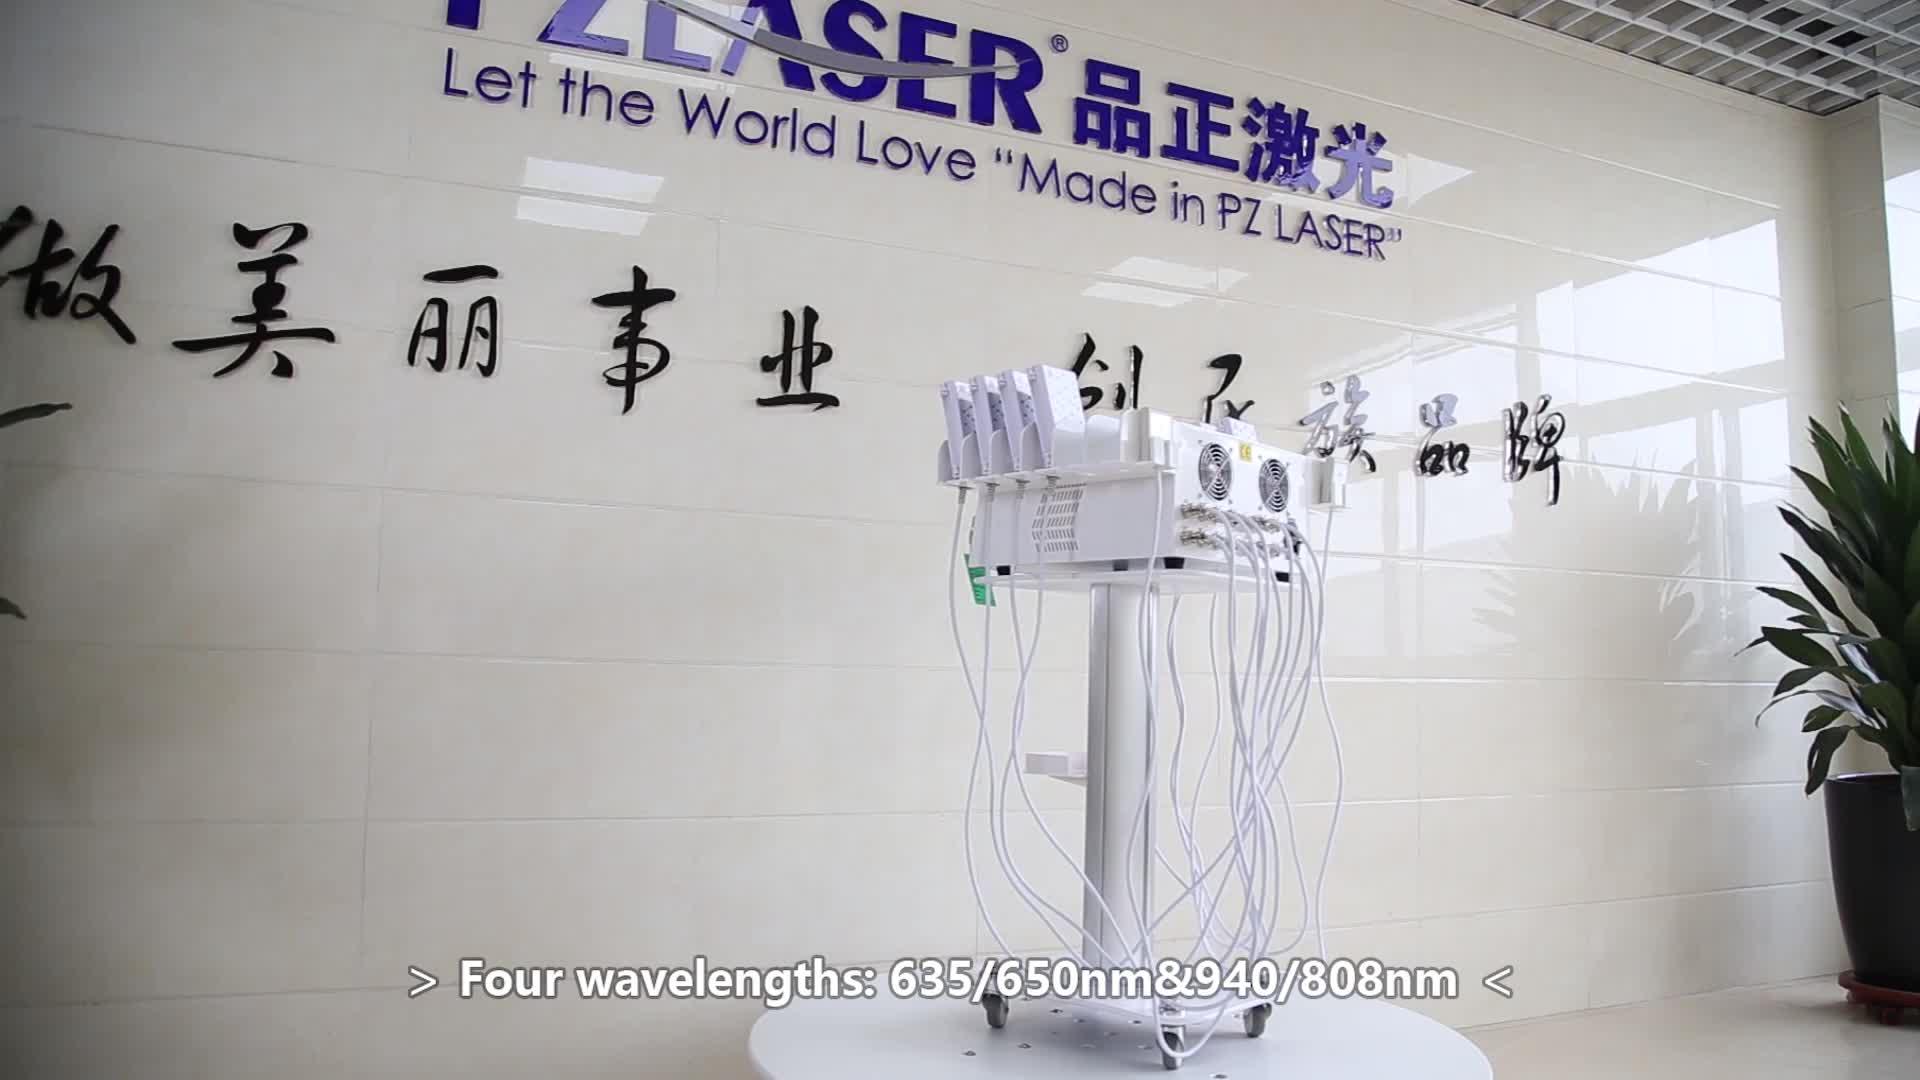 2019 Venta caliente, máquina de láser lipo MÉDICO LÁSER lipo adelgazar máquina de liposucción